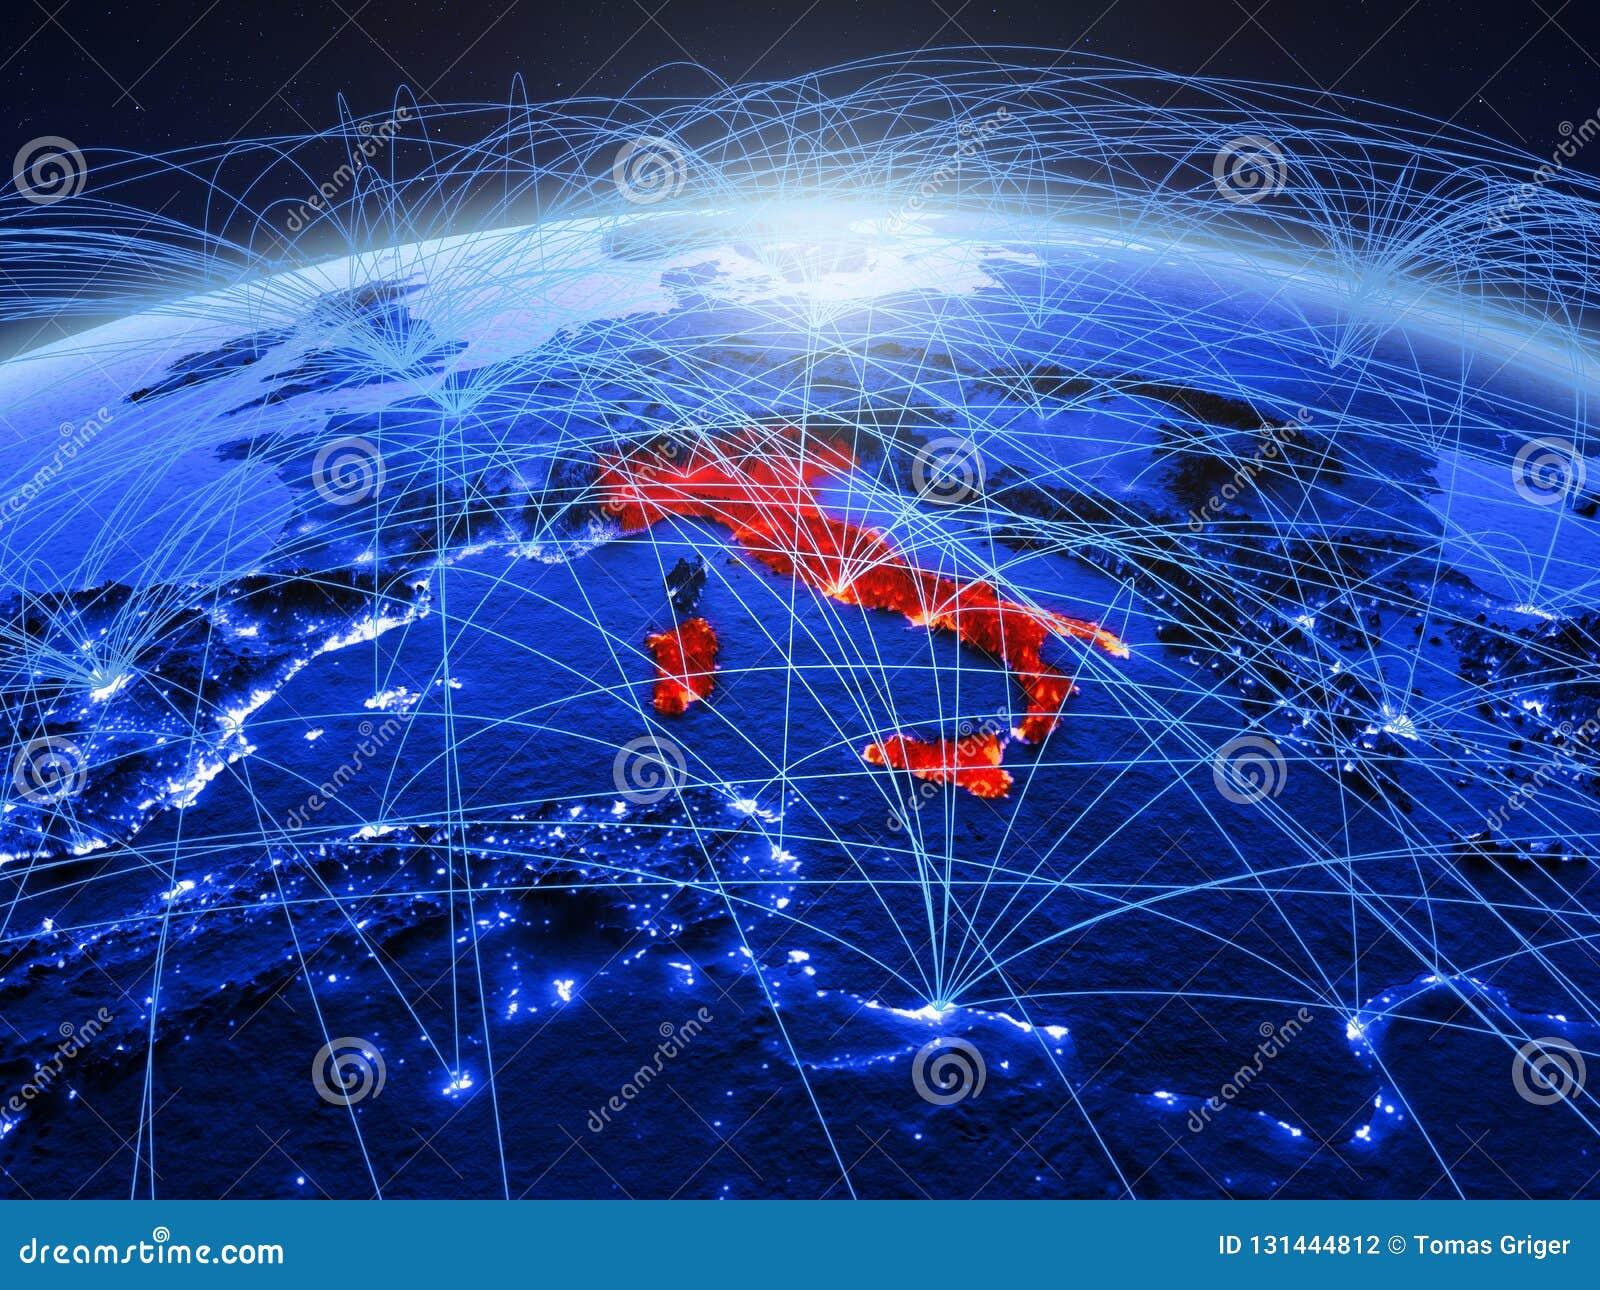 Italië op blauwe digitale aarde met internationaal netwerk die mededeling, reis en verbindingen vertegenwoordigen 3D Illustratie